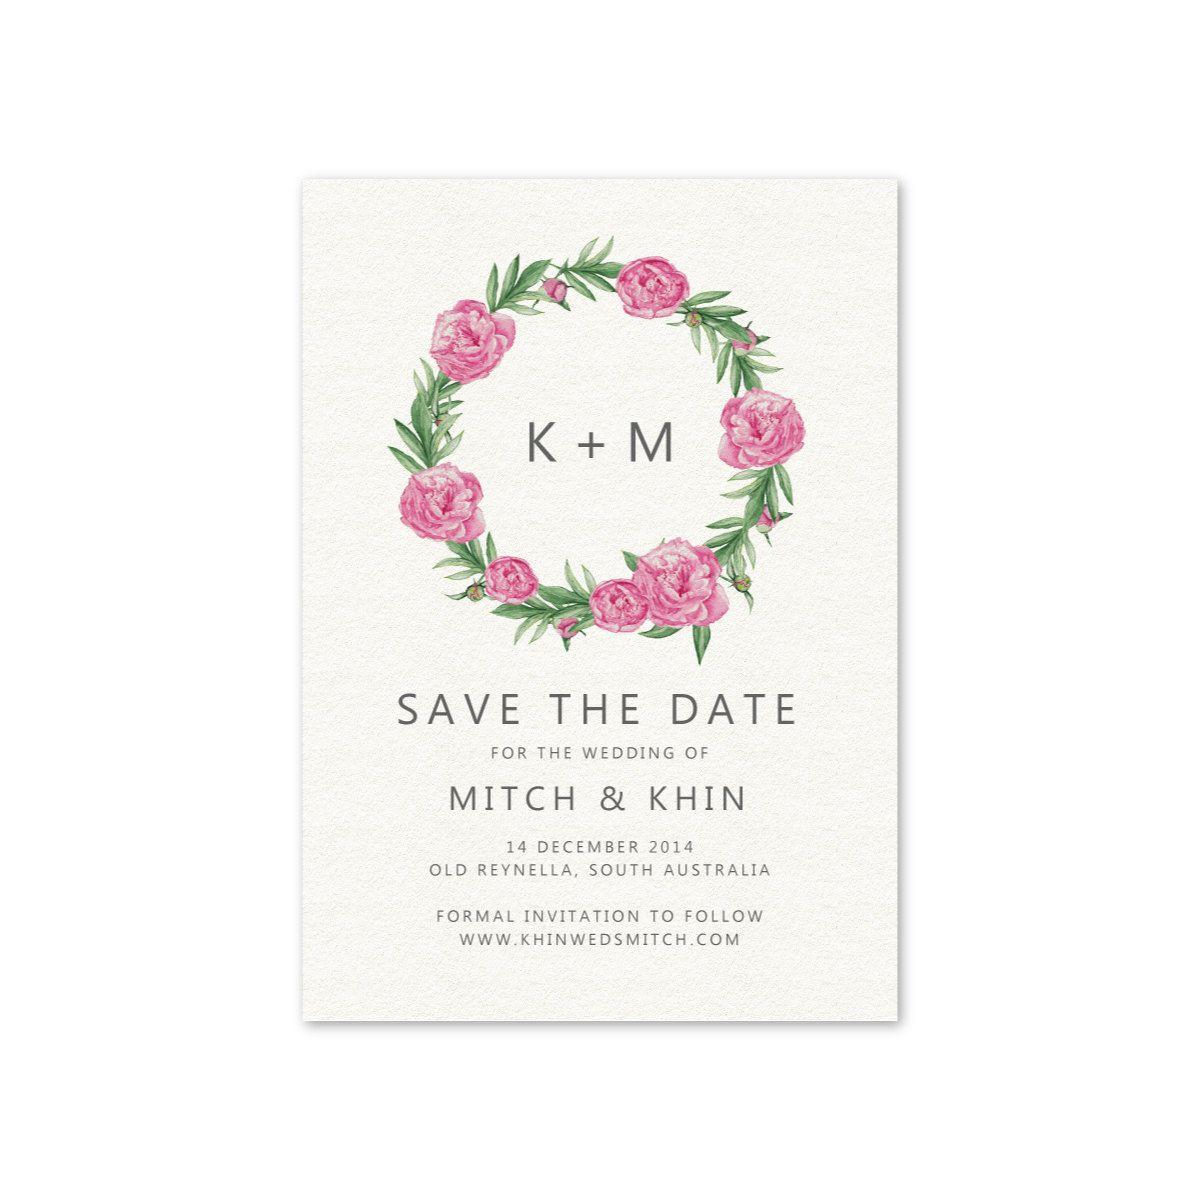 Wedding save the date printable invitation card pink peony floral wedding save the date printable invitation card pink peony floral wreath simple modern invitation stopboris Choice Image